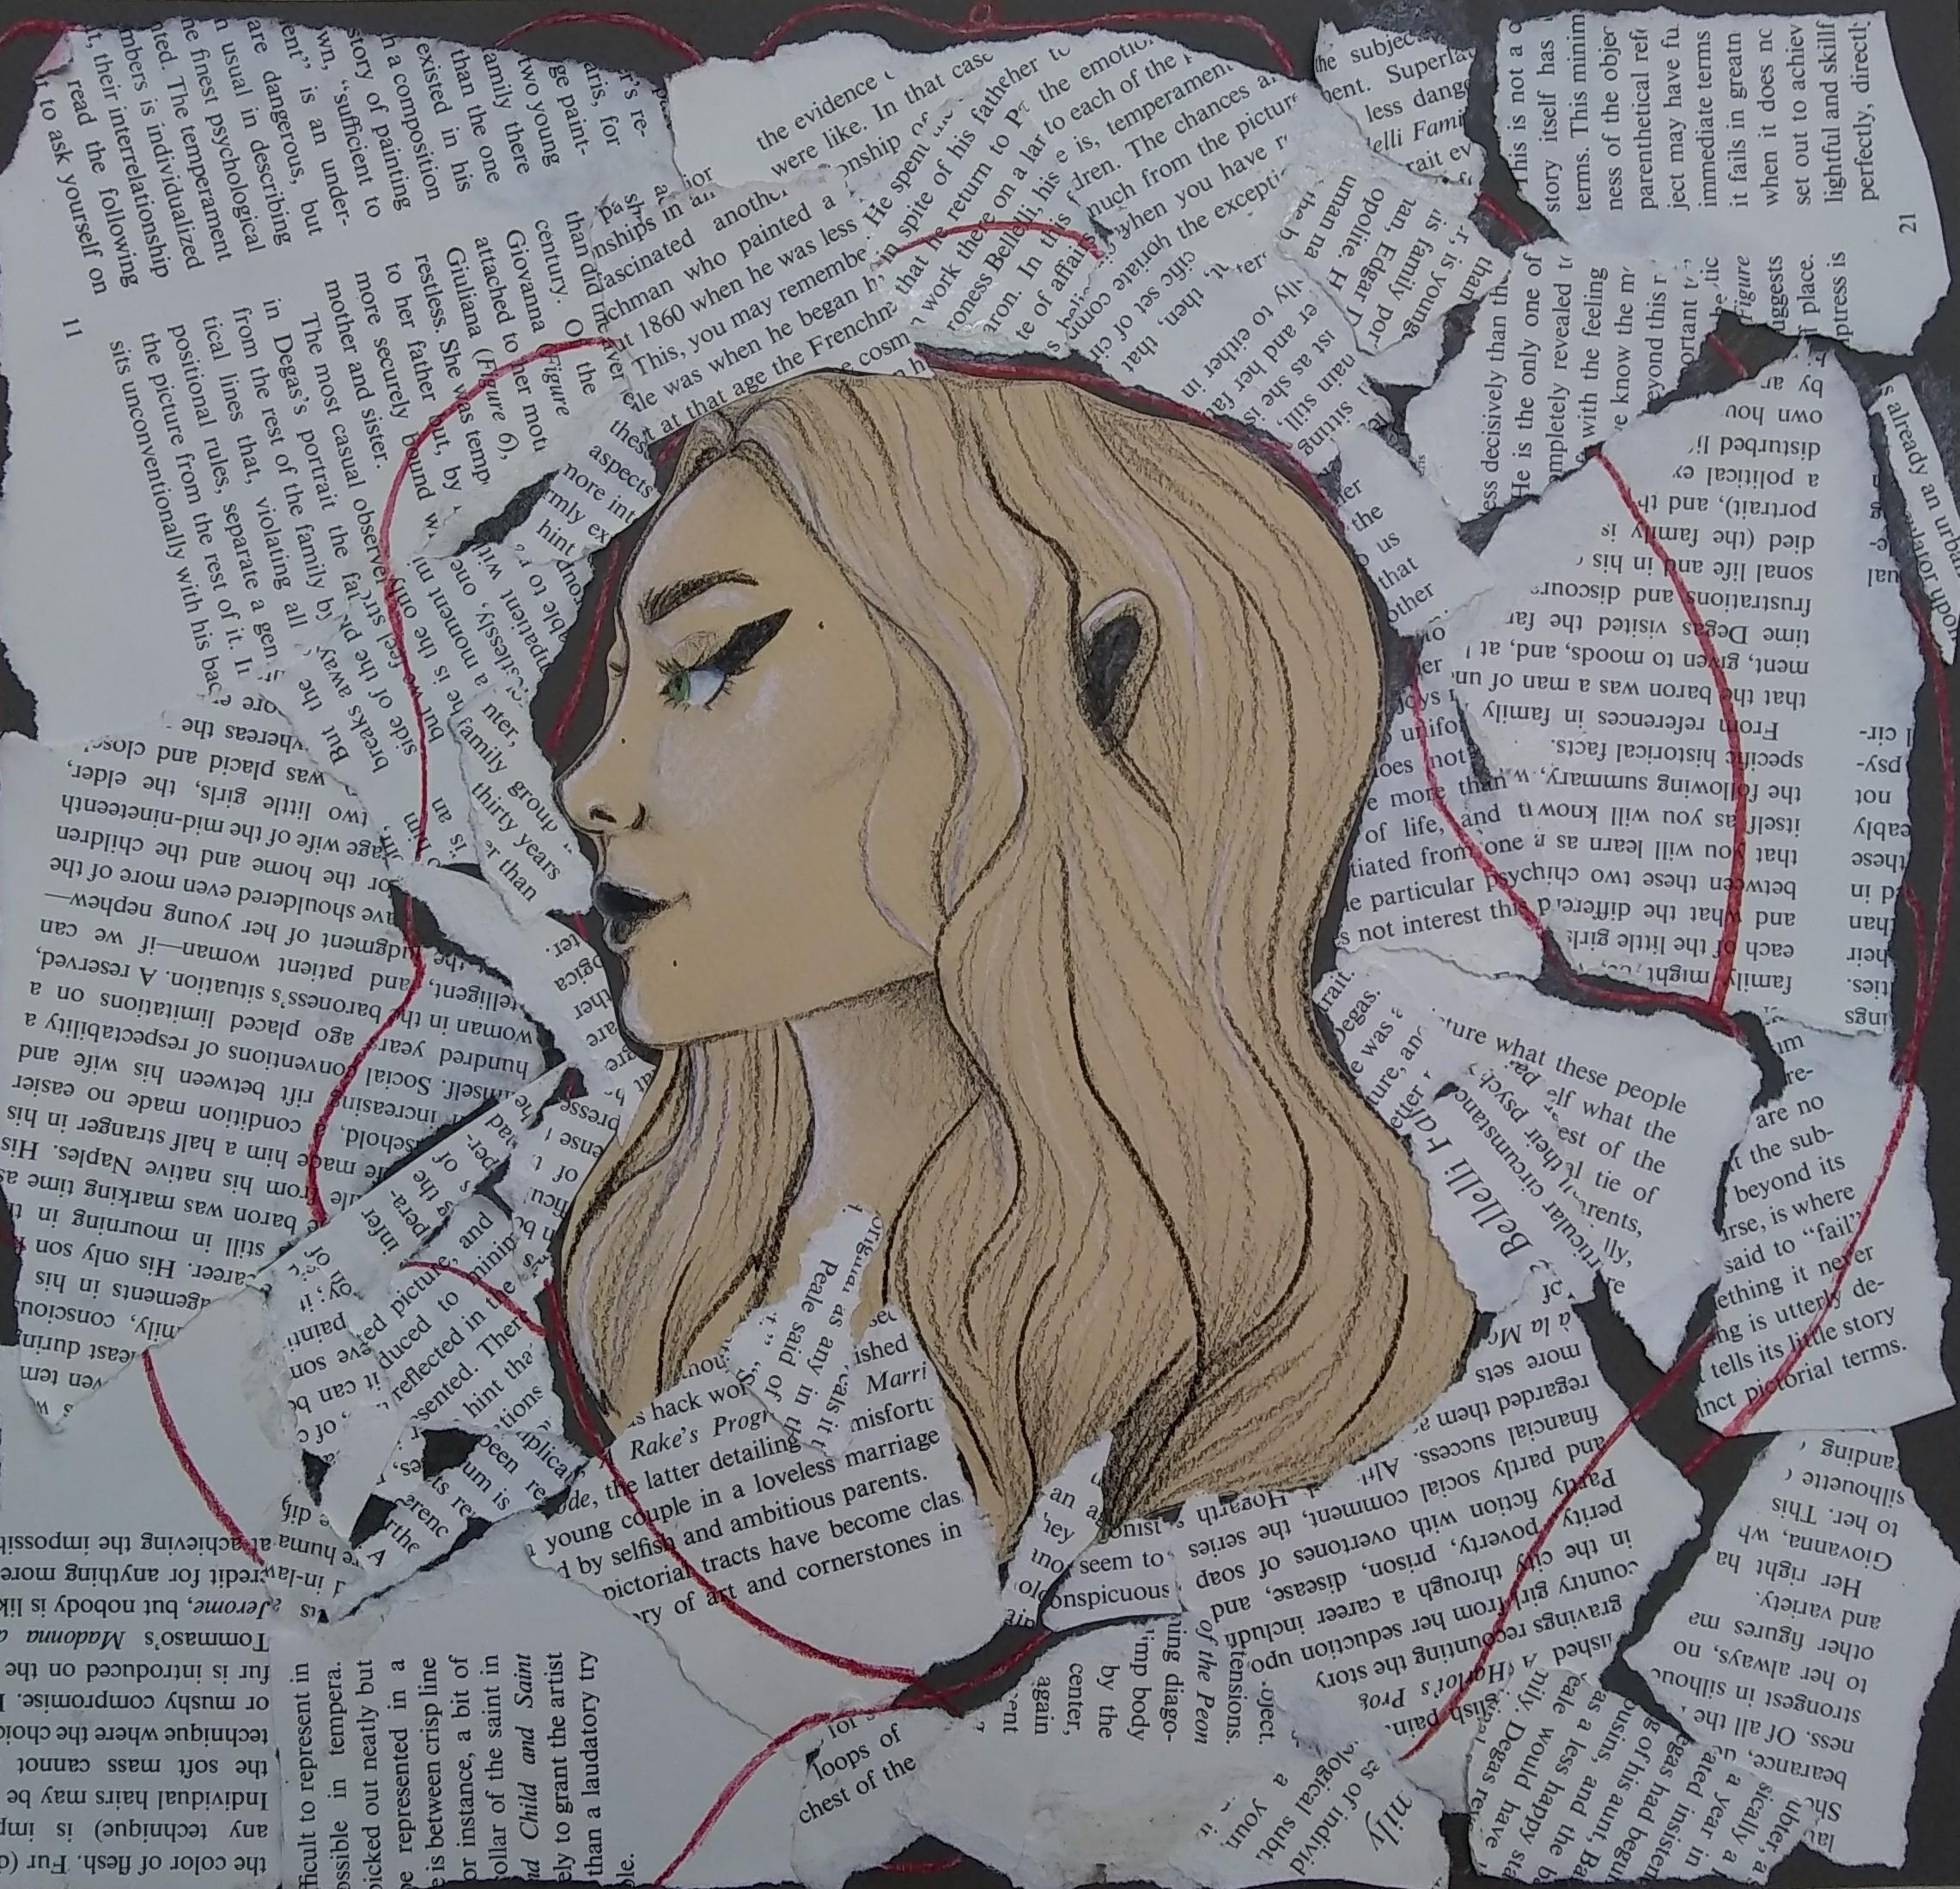 Regan Holkema: Mixed Media (Collage, Colored Pencil, Ink) Composition by Regan Holkema